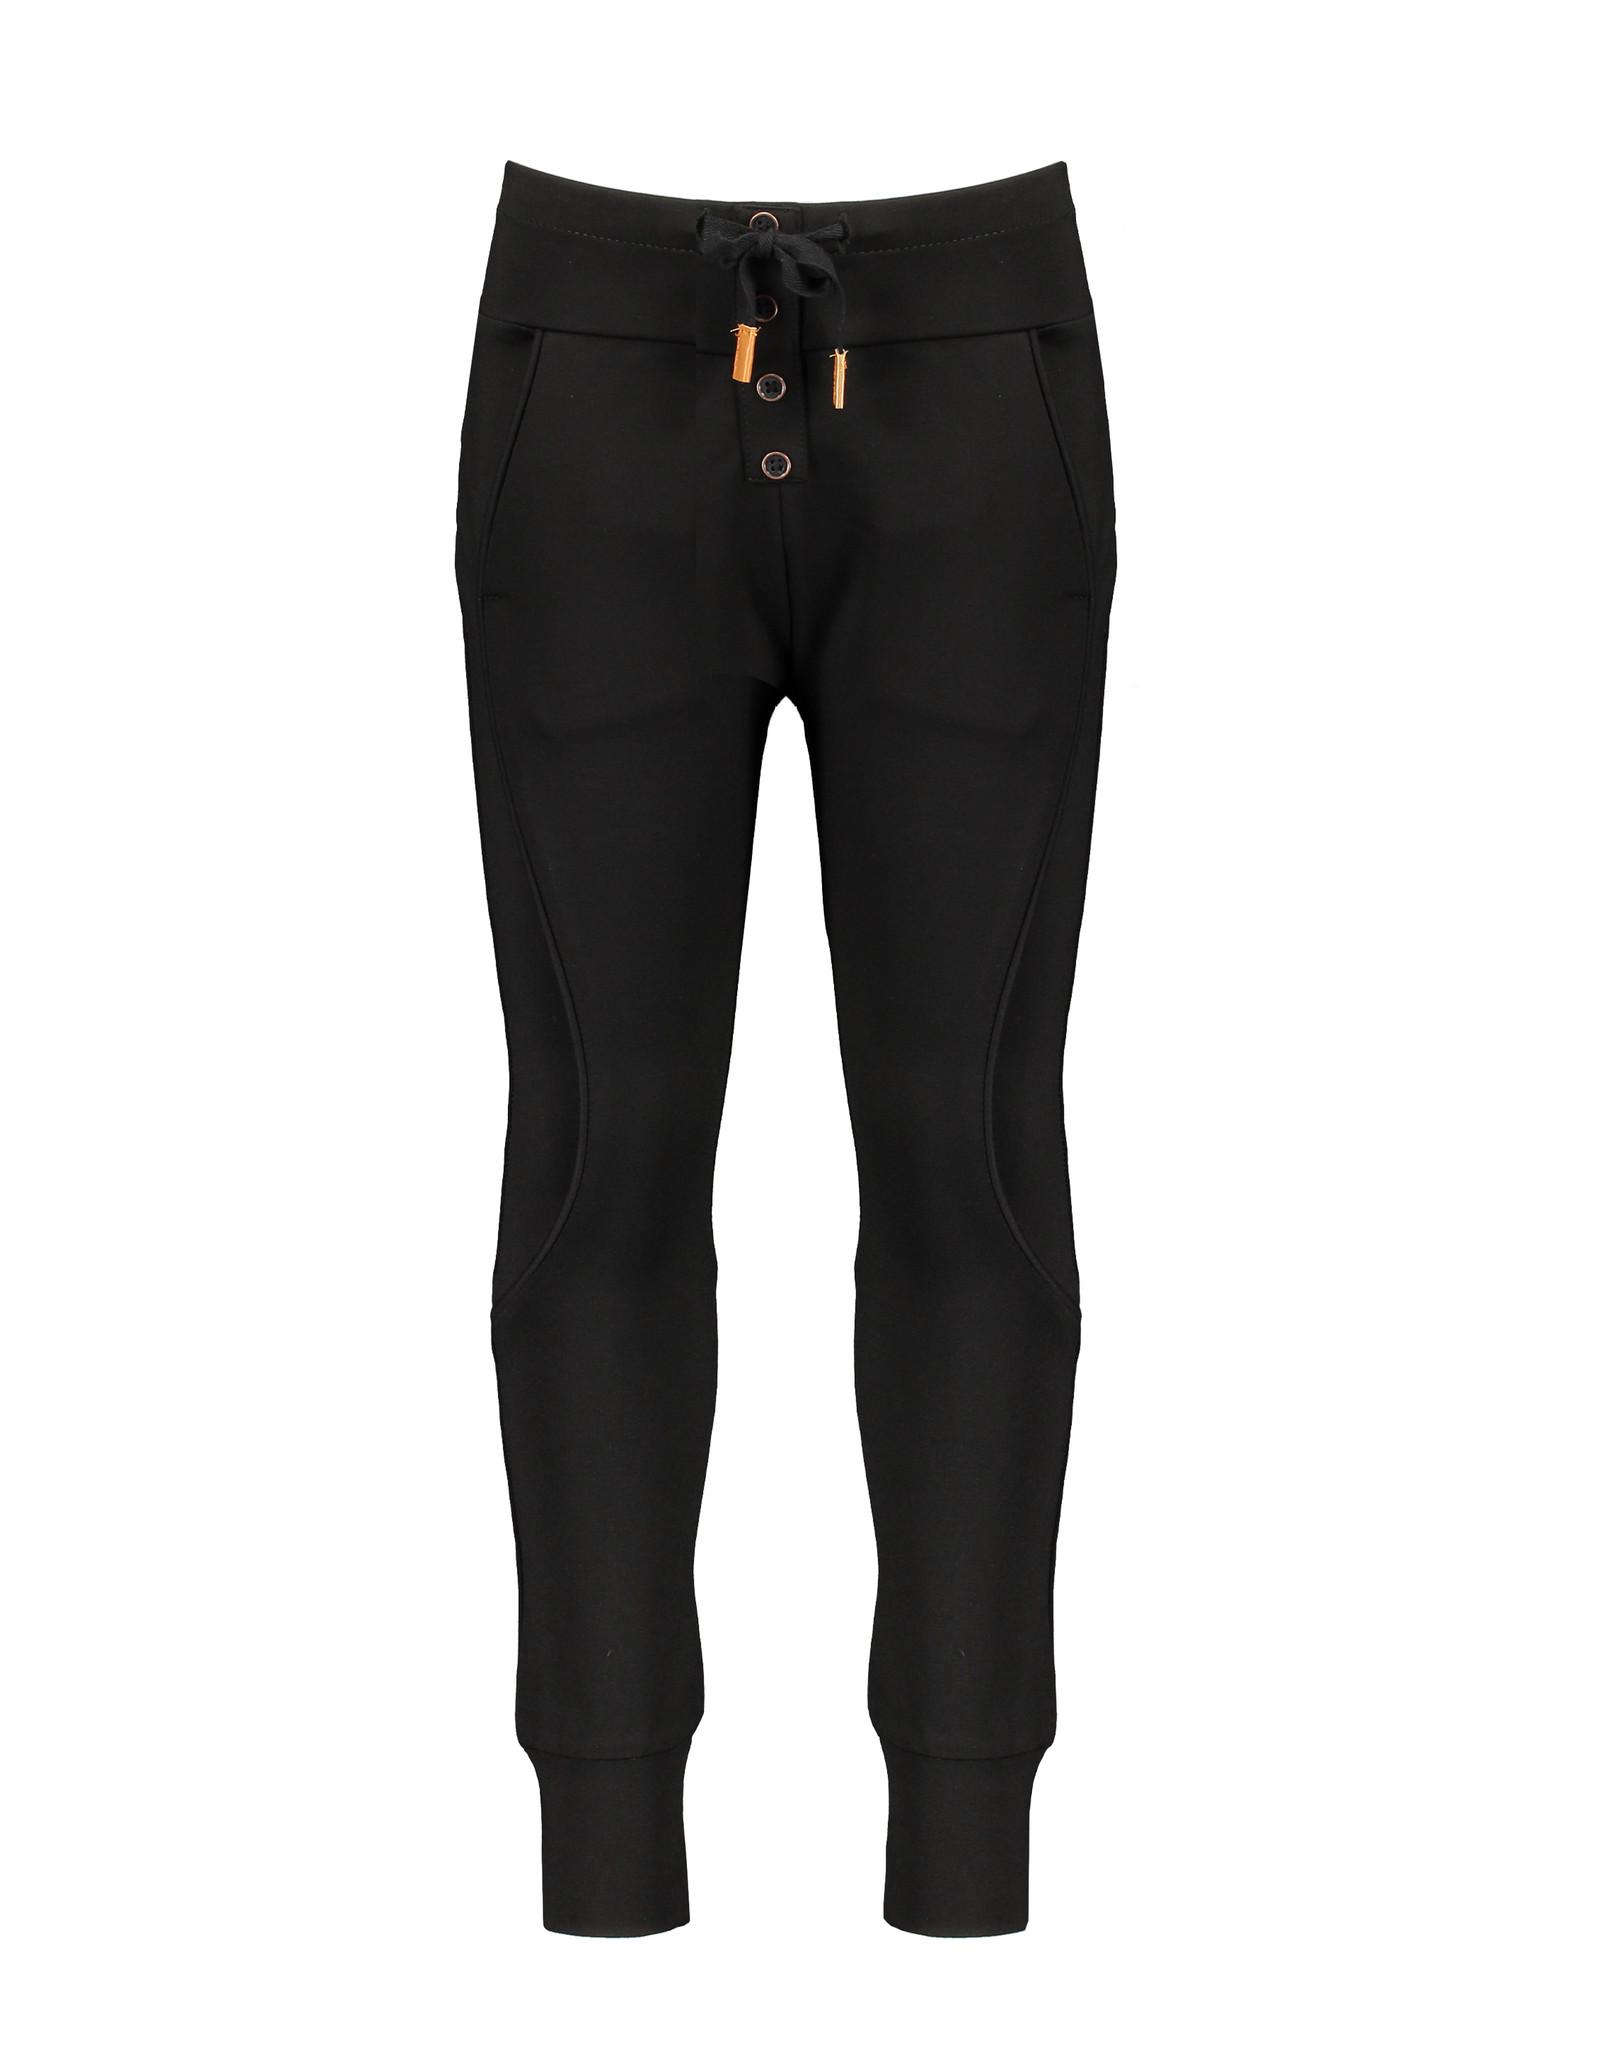 NONO NoNo Soso Pants With Fancy Seams Jet Black